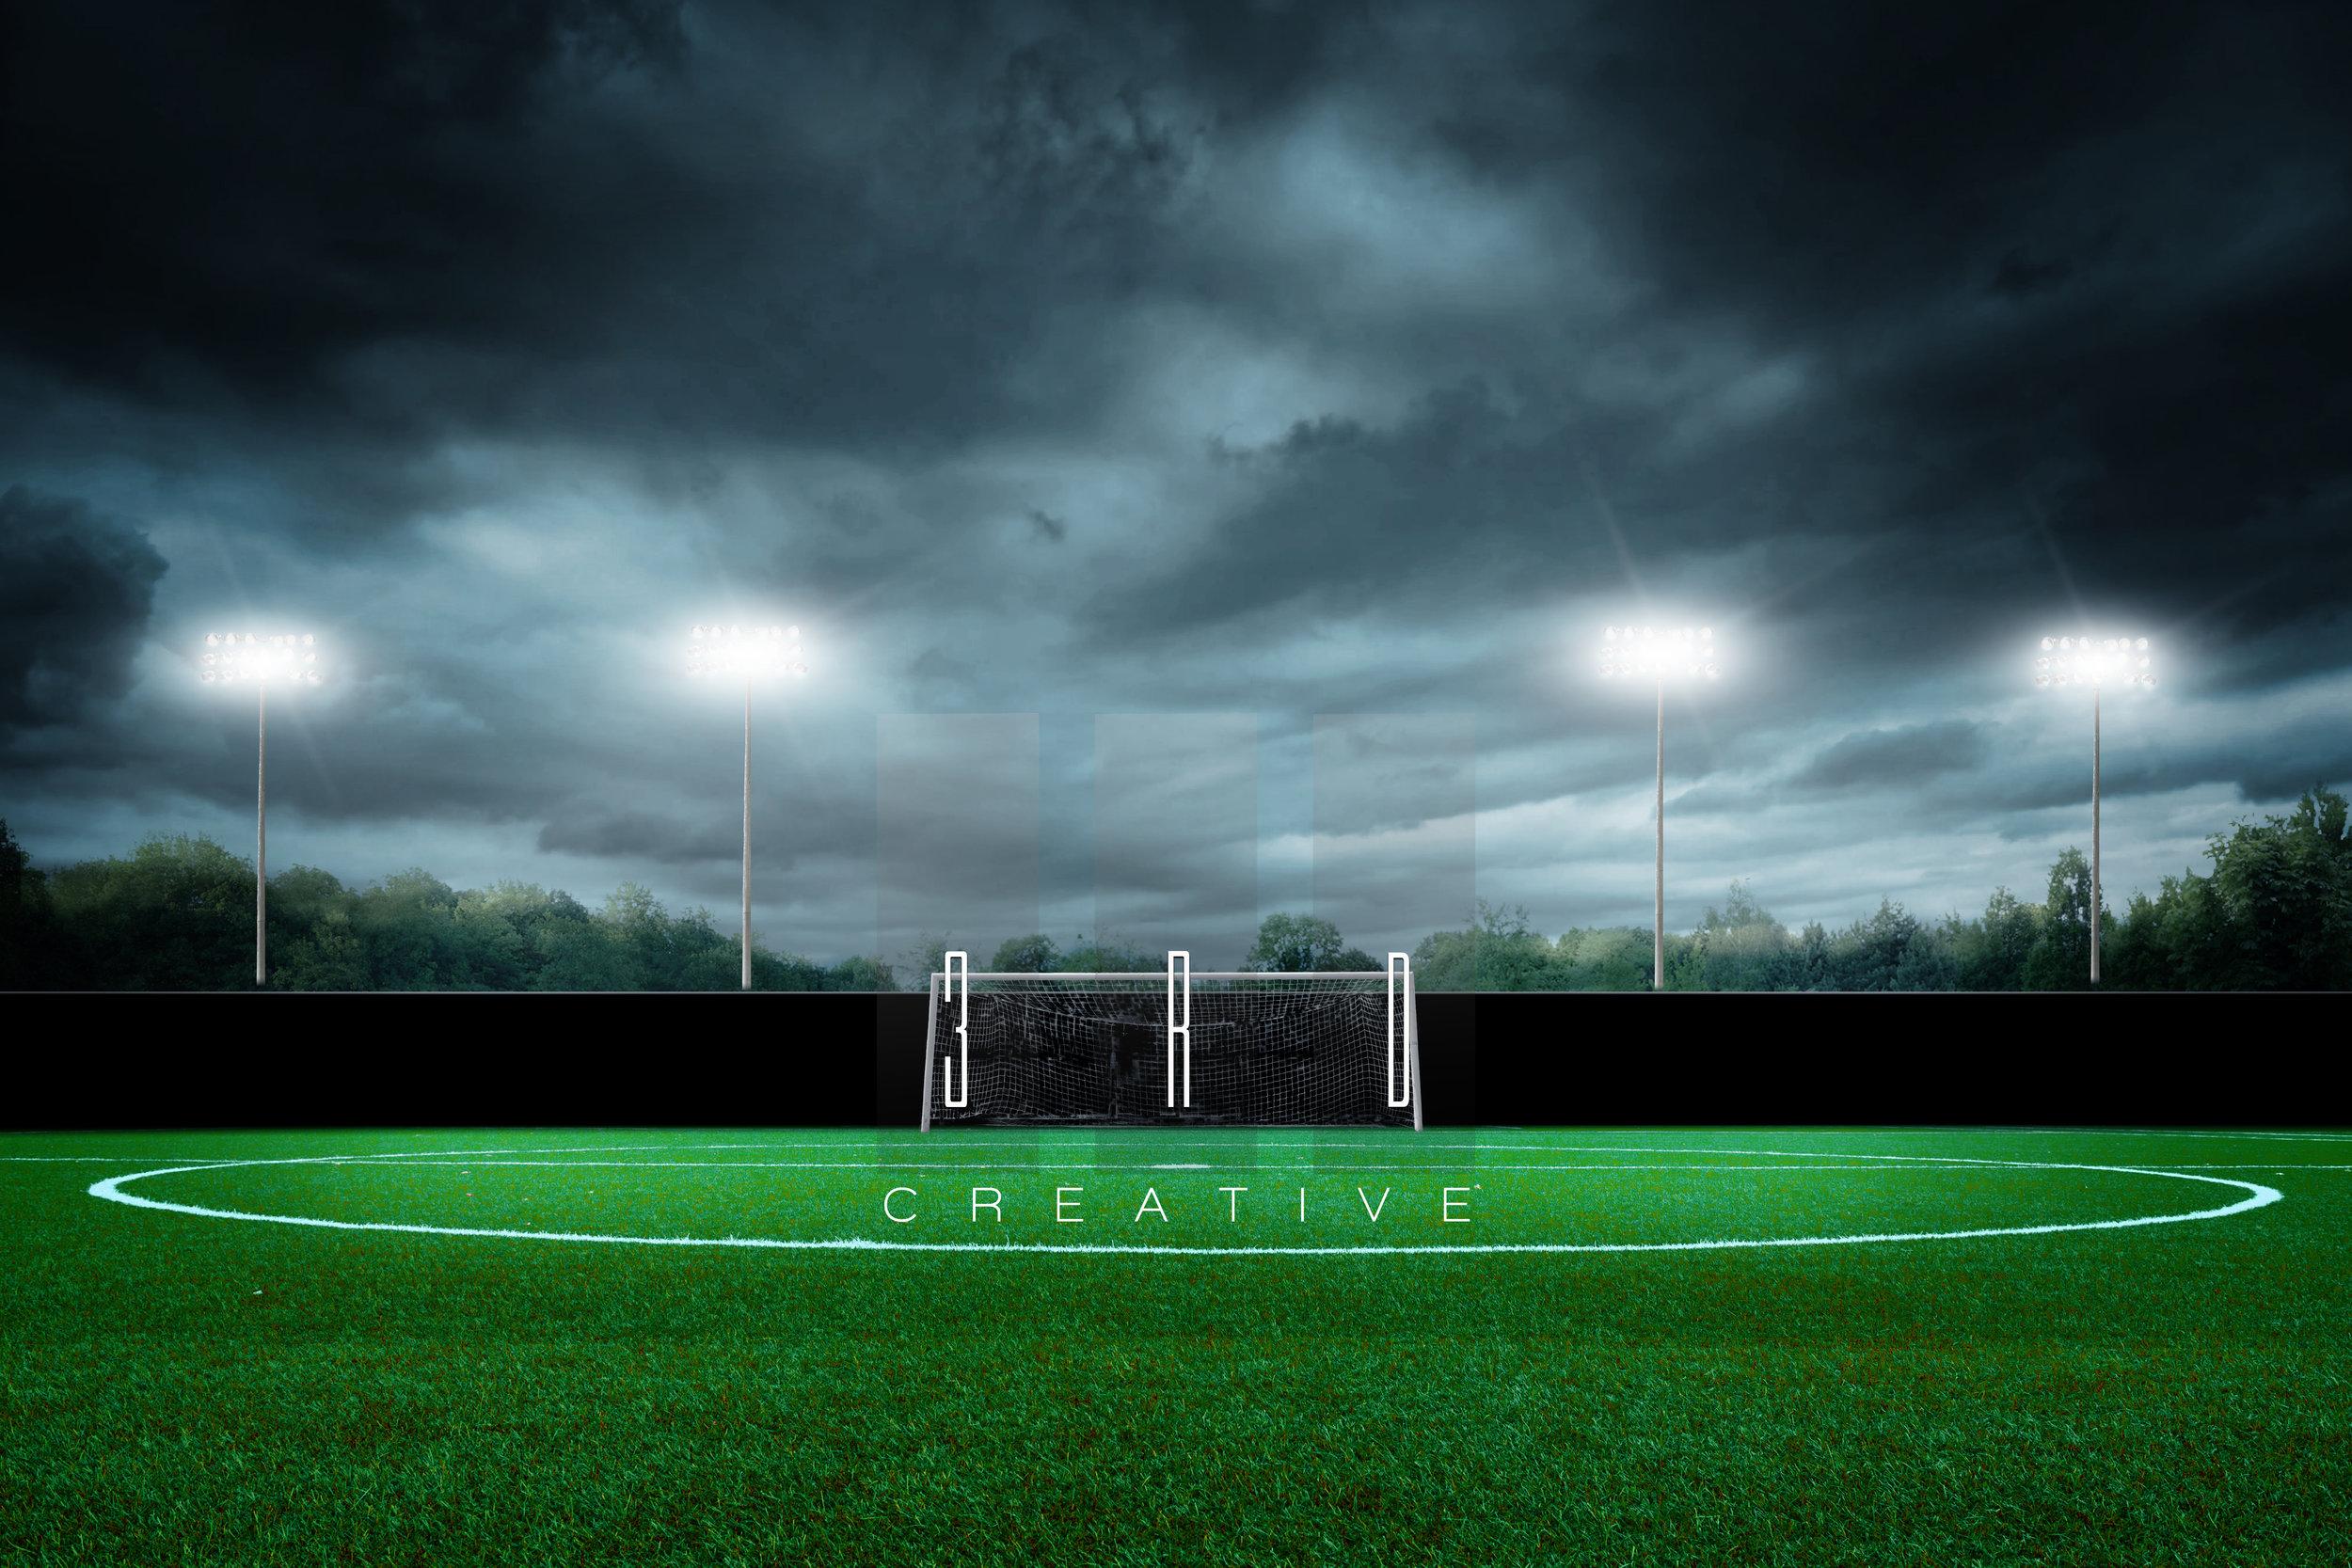 Rangers_Soccer_Horizontal-24x16_Plain.jpg